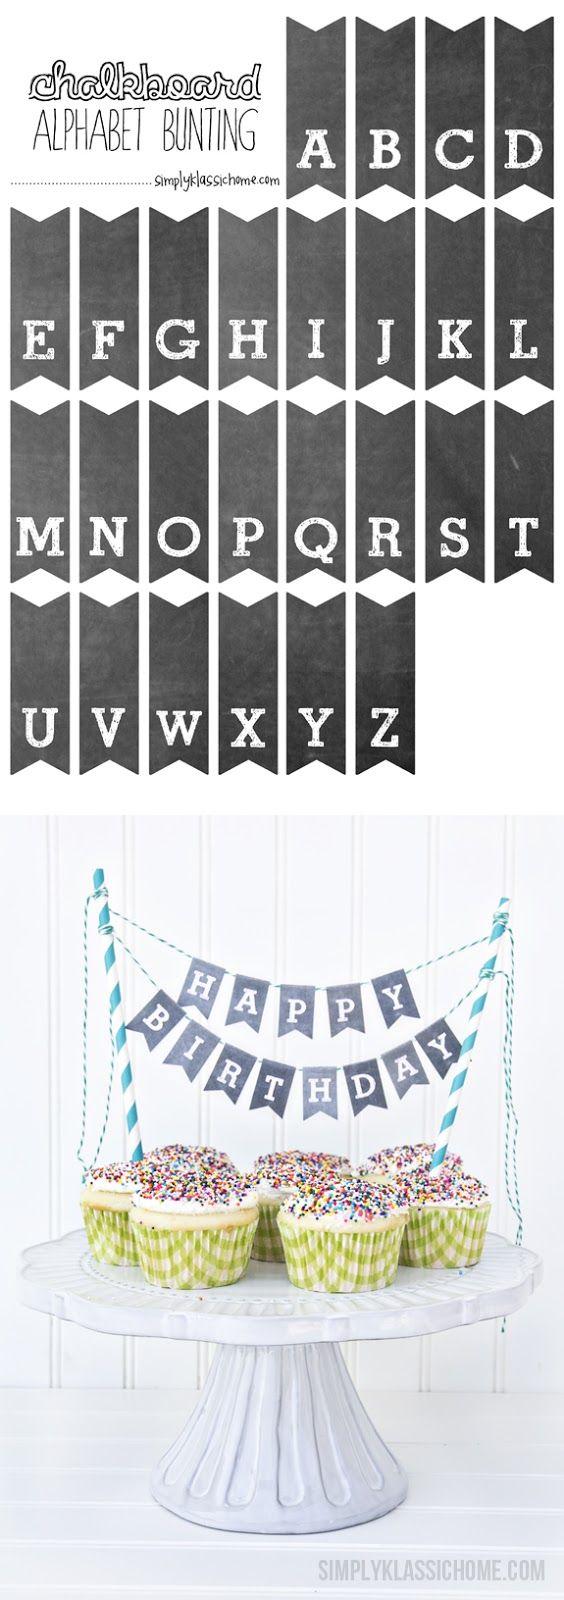 DIY: Printable Chalkboard Letters Cake Bunting